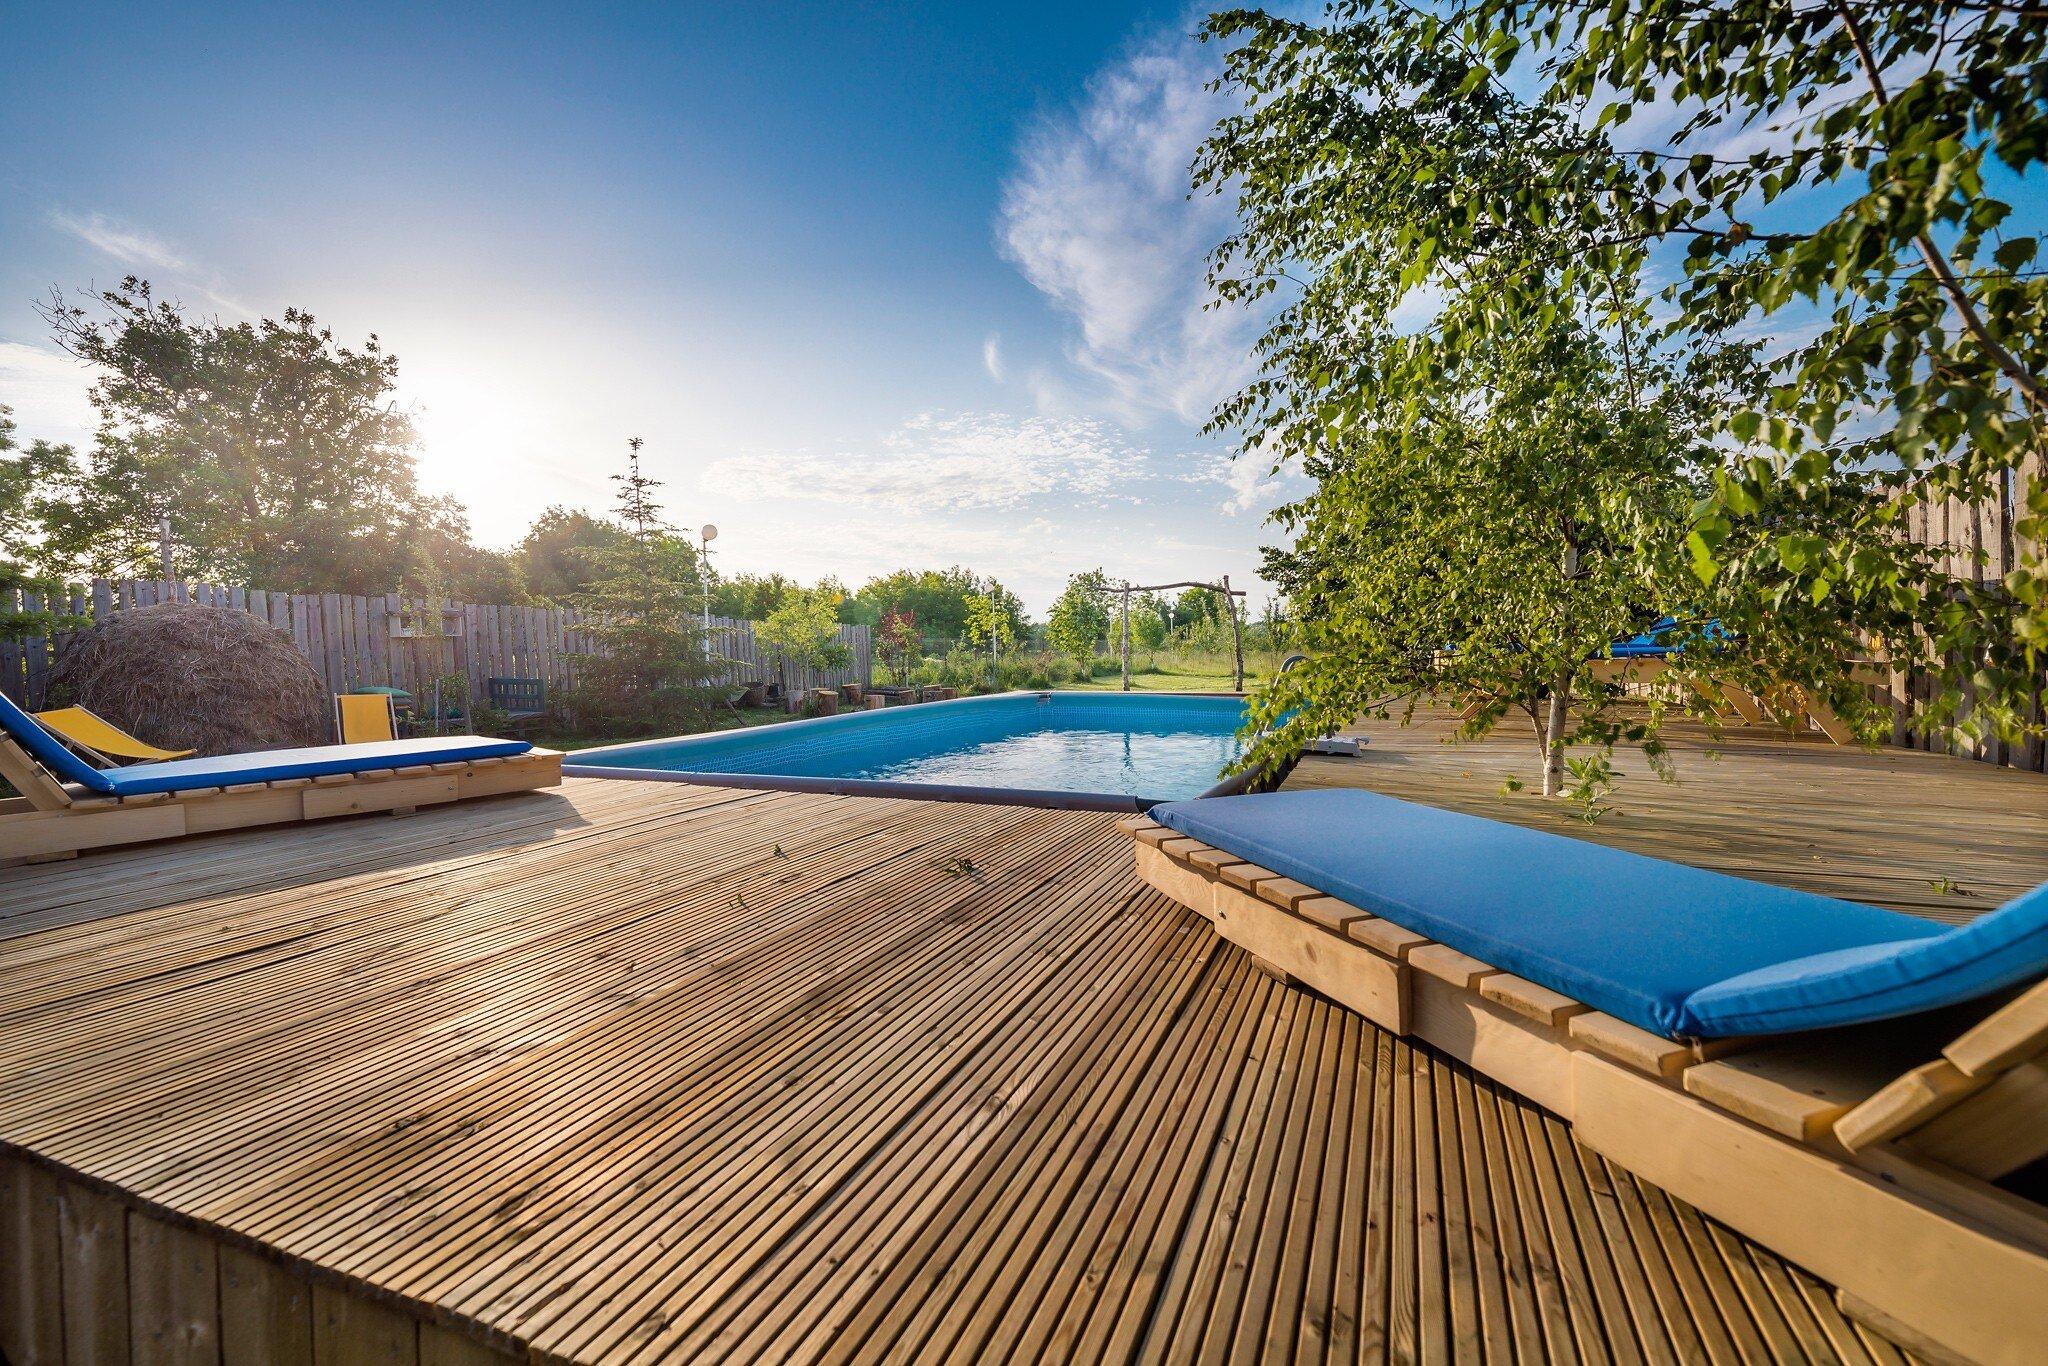 rural piscina ilfov